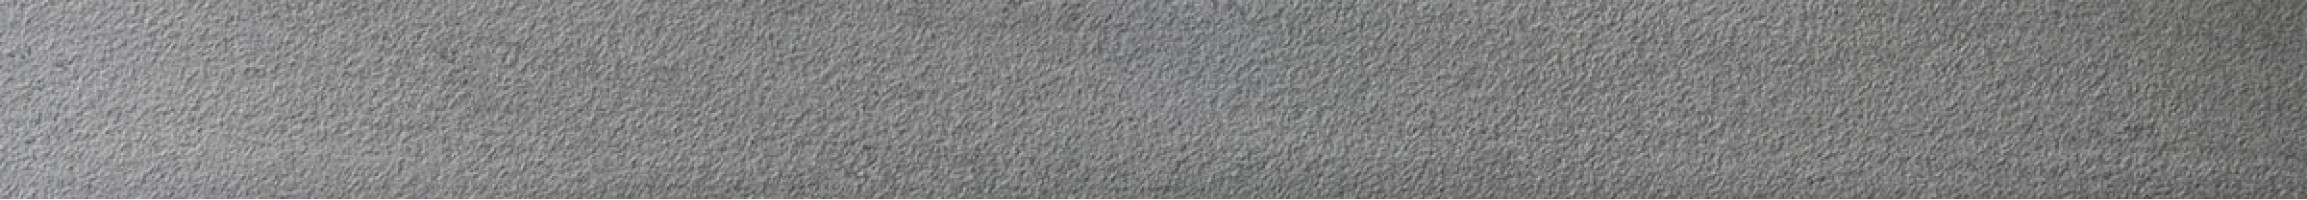 Подступенок Venatto Texture Tabica Grain Dolmen 15x160